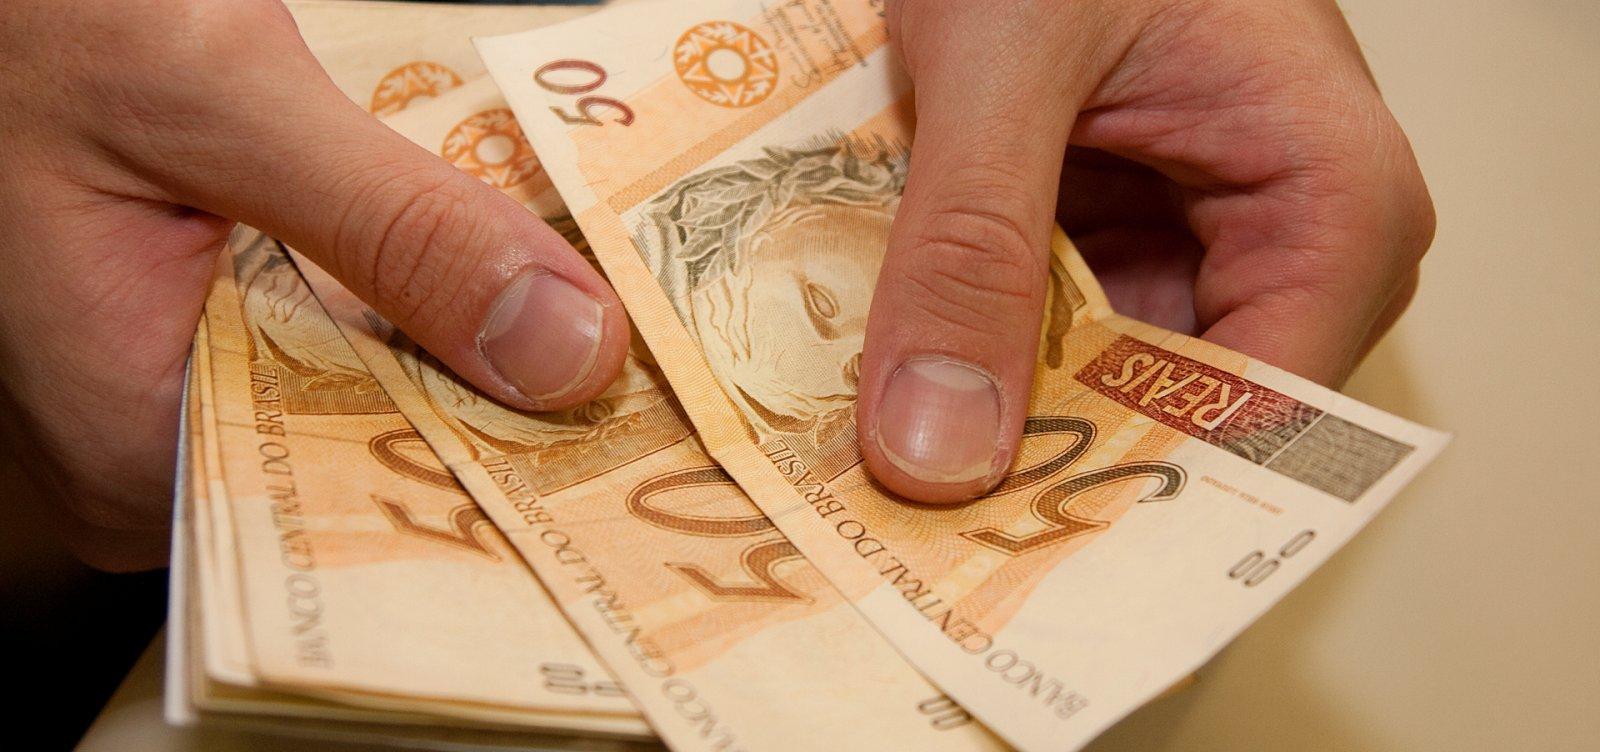 Diferença salarial entre pobres e ricos é recorde, aponta IBGE